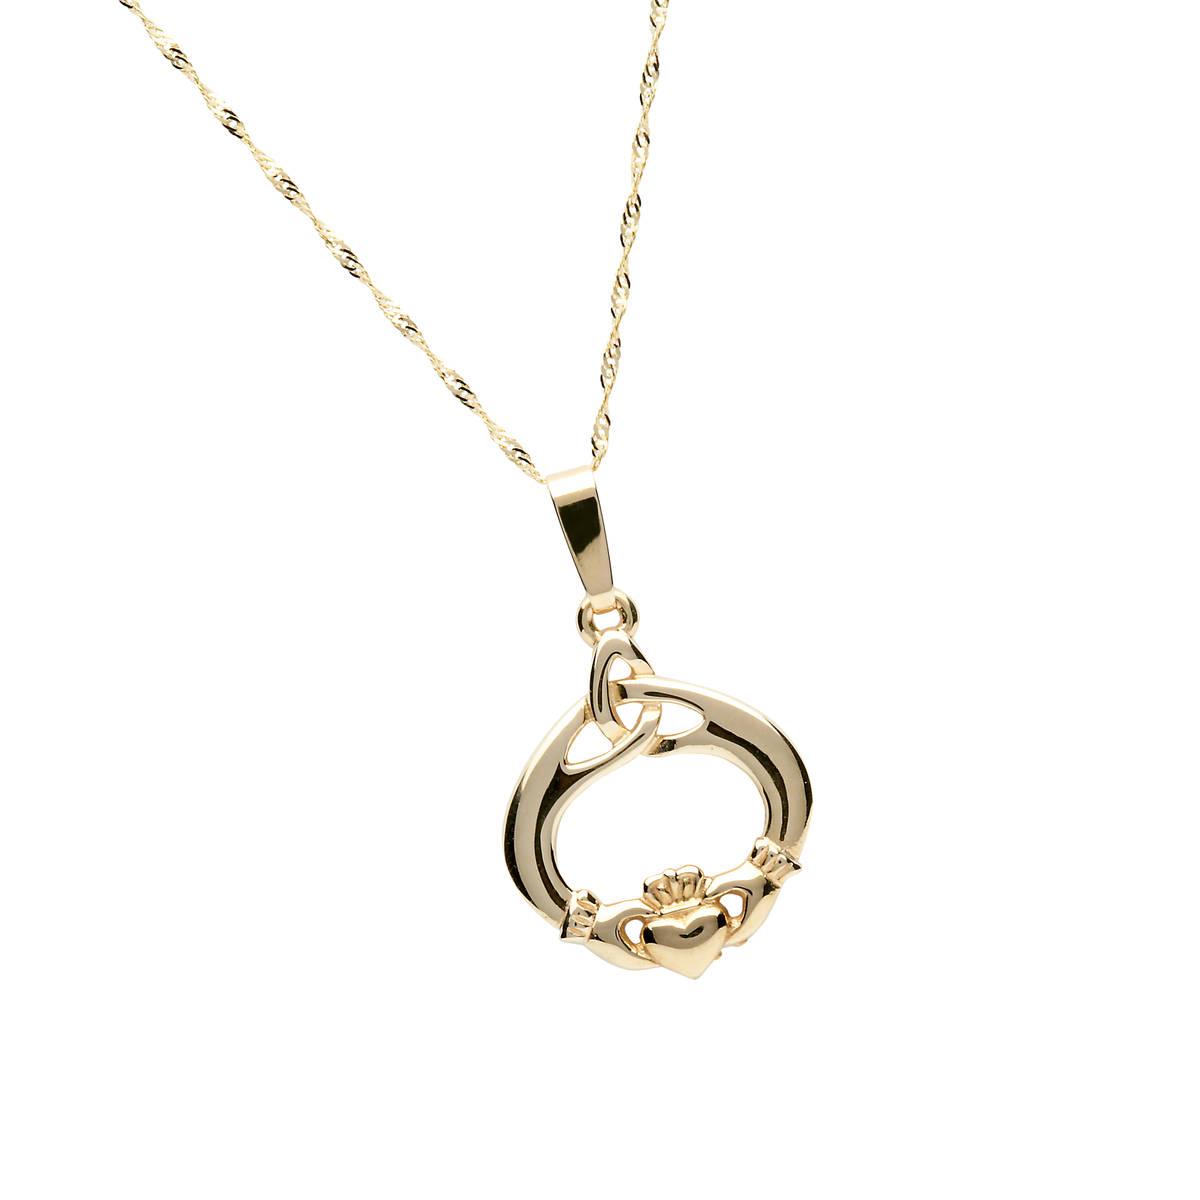 10 carat Claddagh and knot pendant